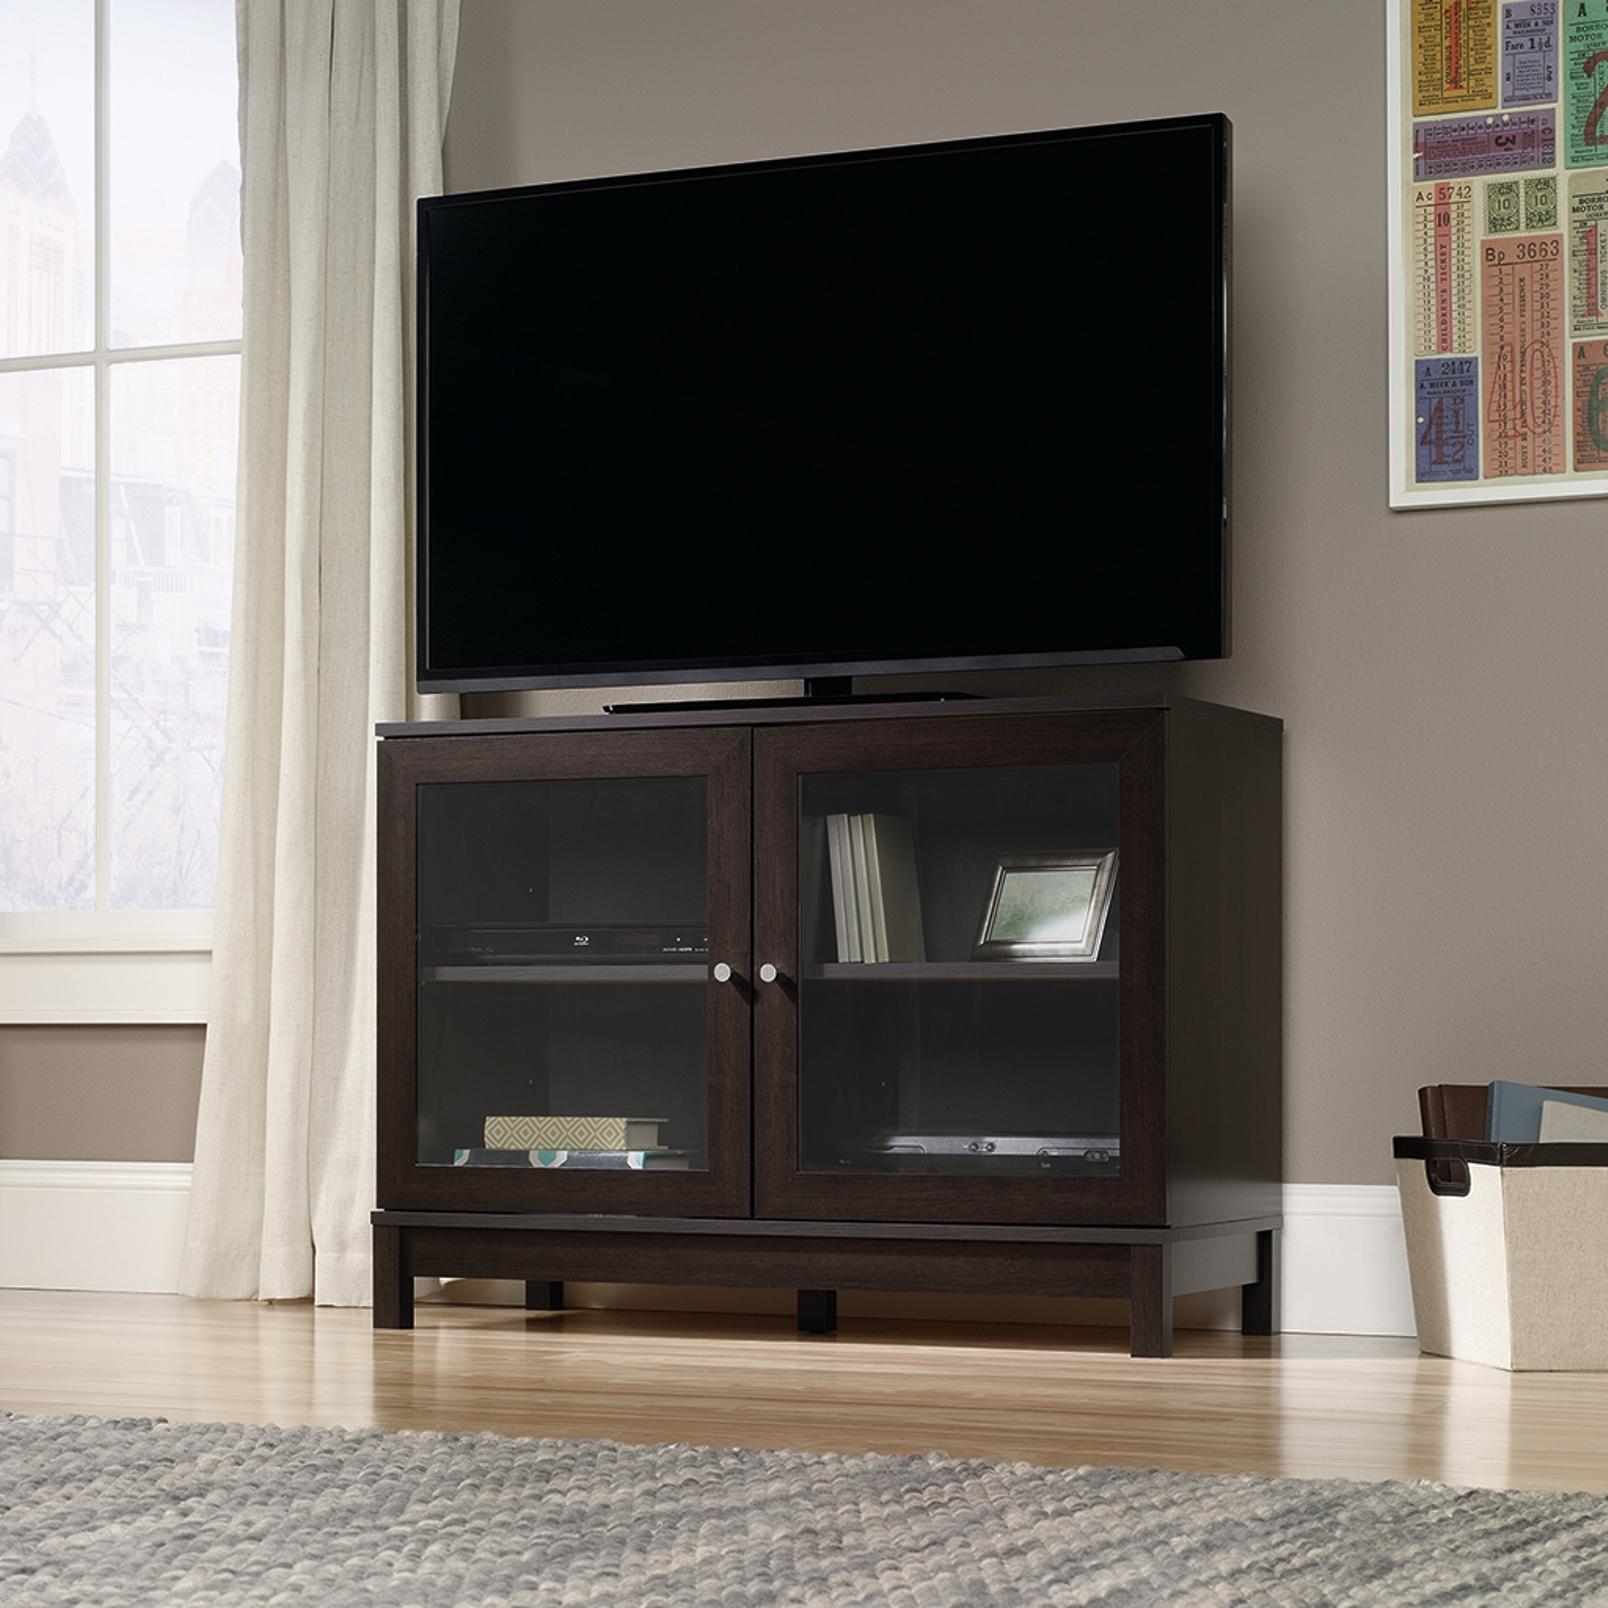 sauder harper tv stand - Sauder Tv Stands